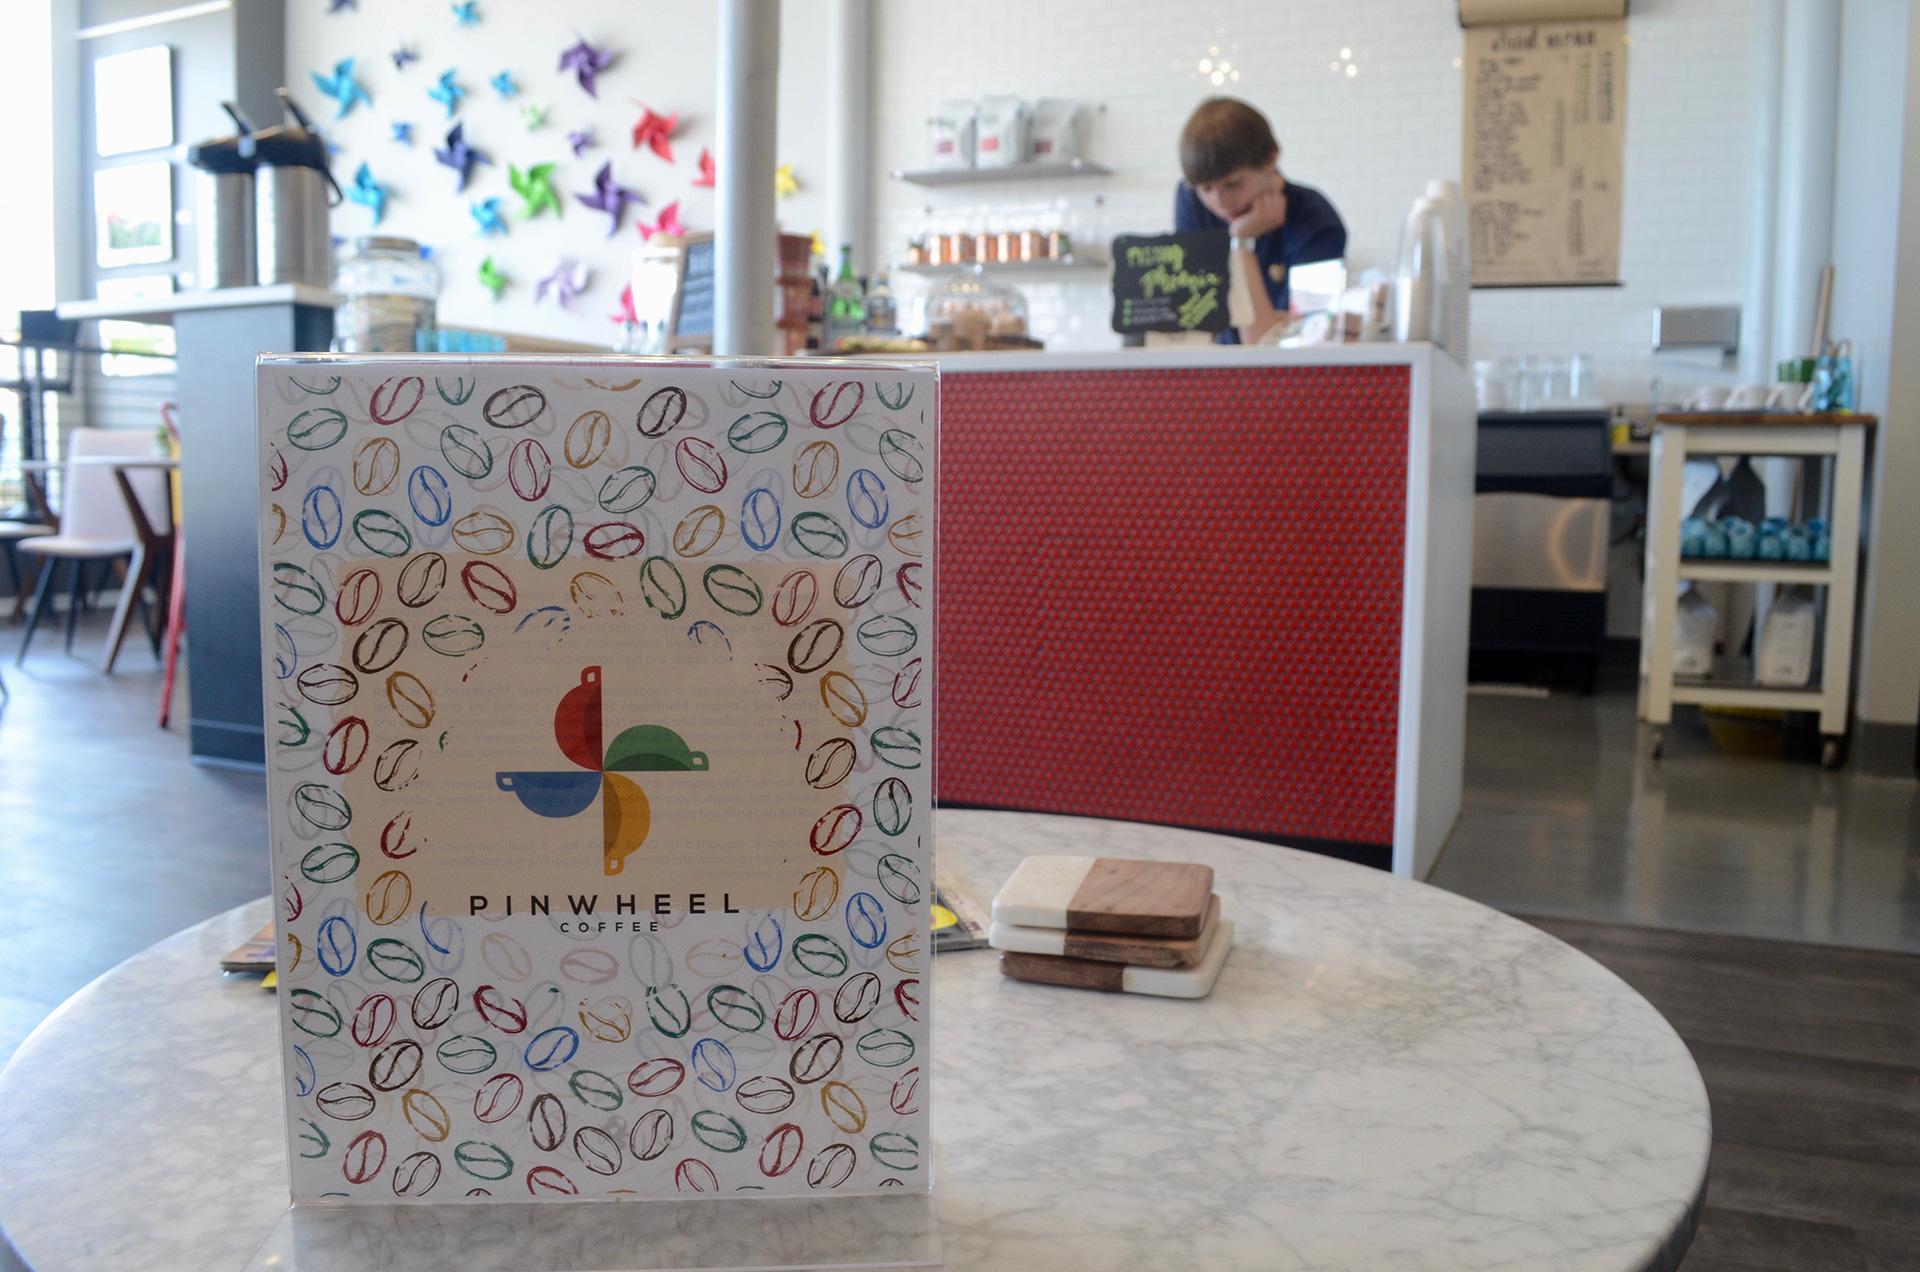 Teaching The Next Generation Of Baristas At Pinwheel Coffee In Denver photo